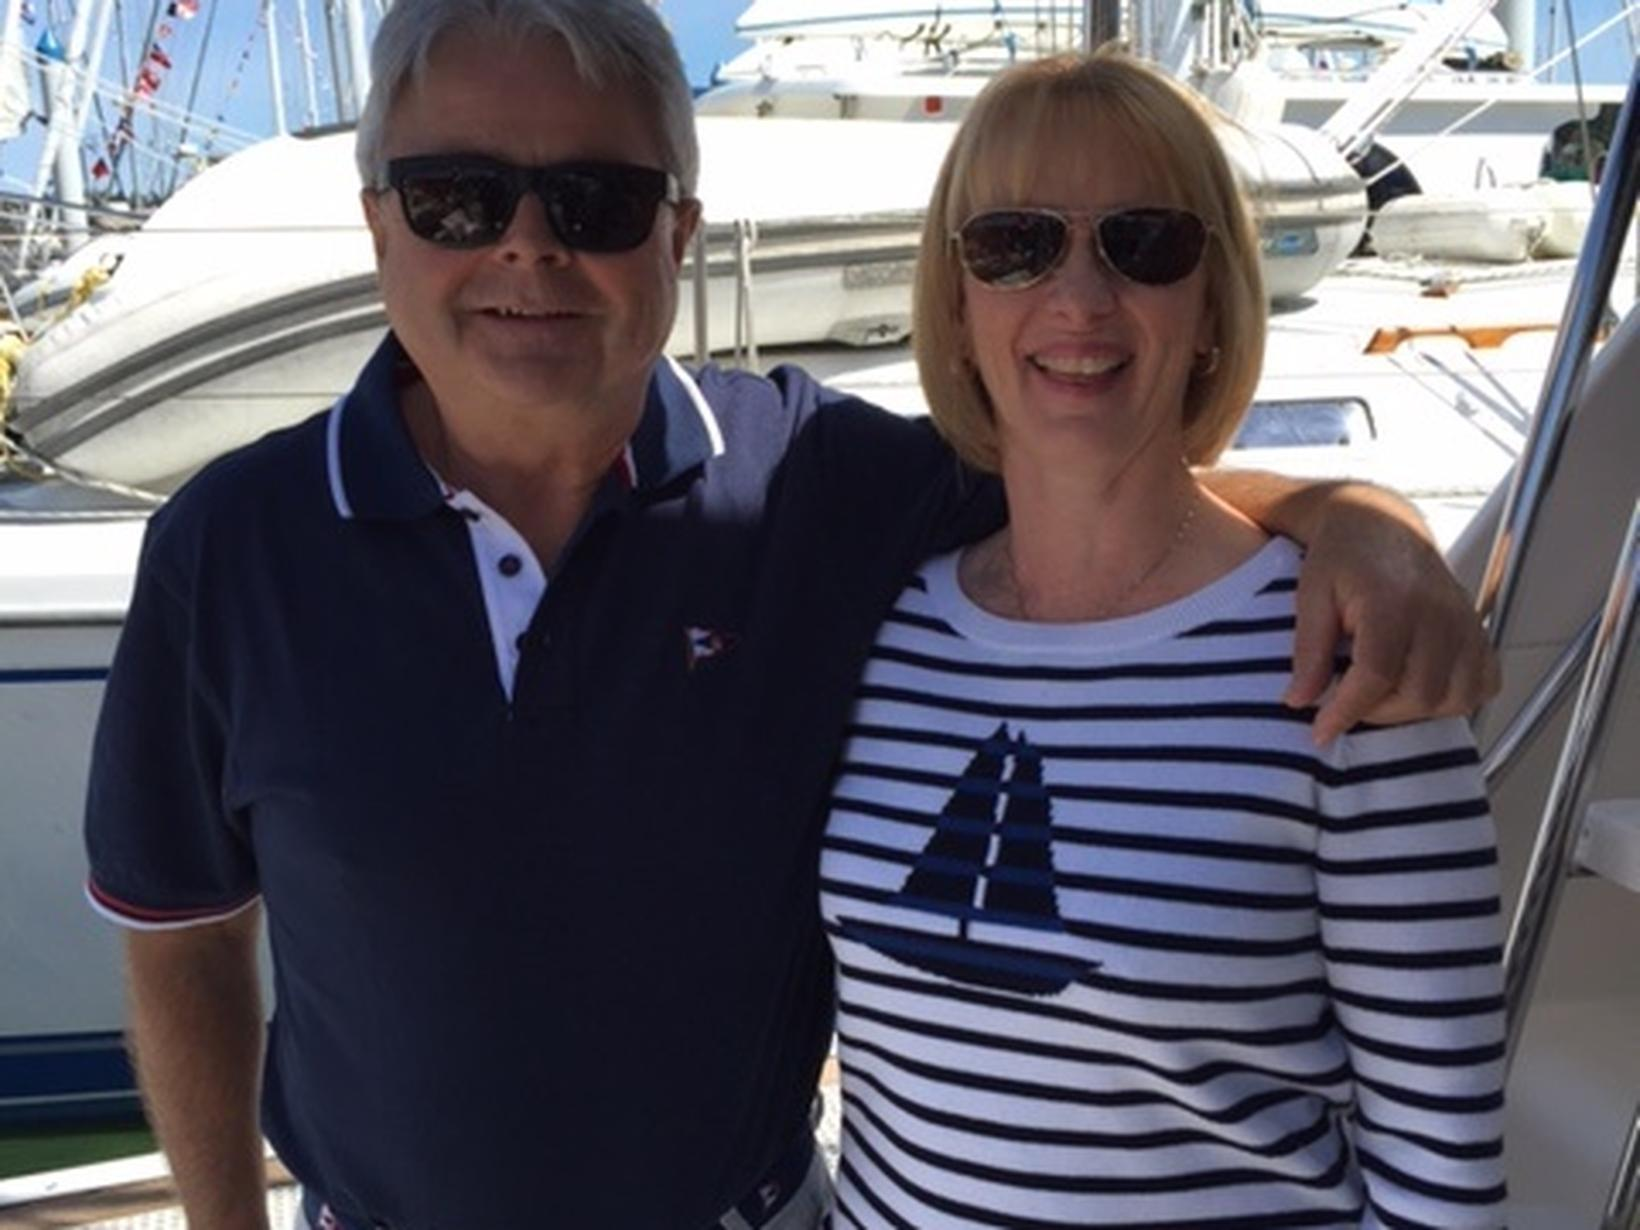 Jacqueline & Michael from Victoria, British Columbia, Canada